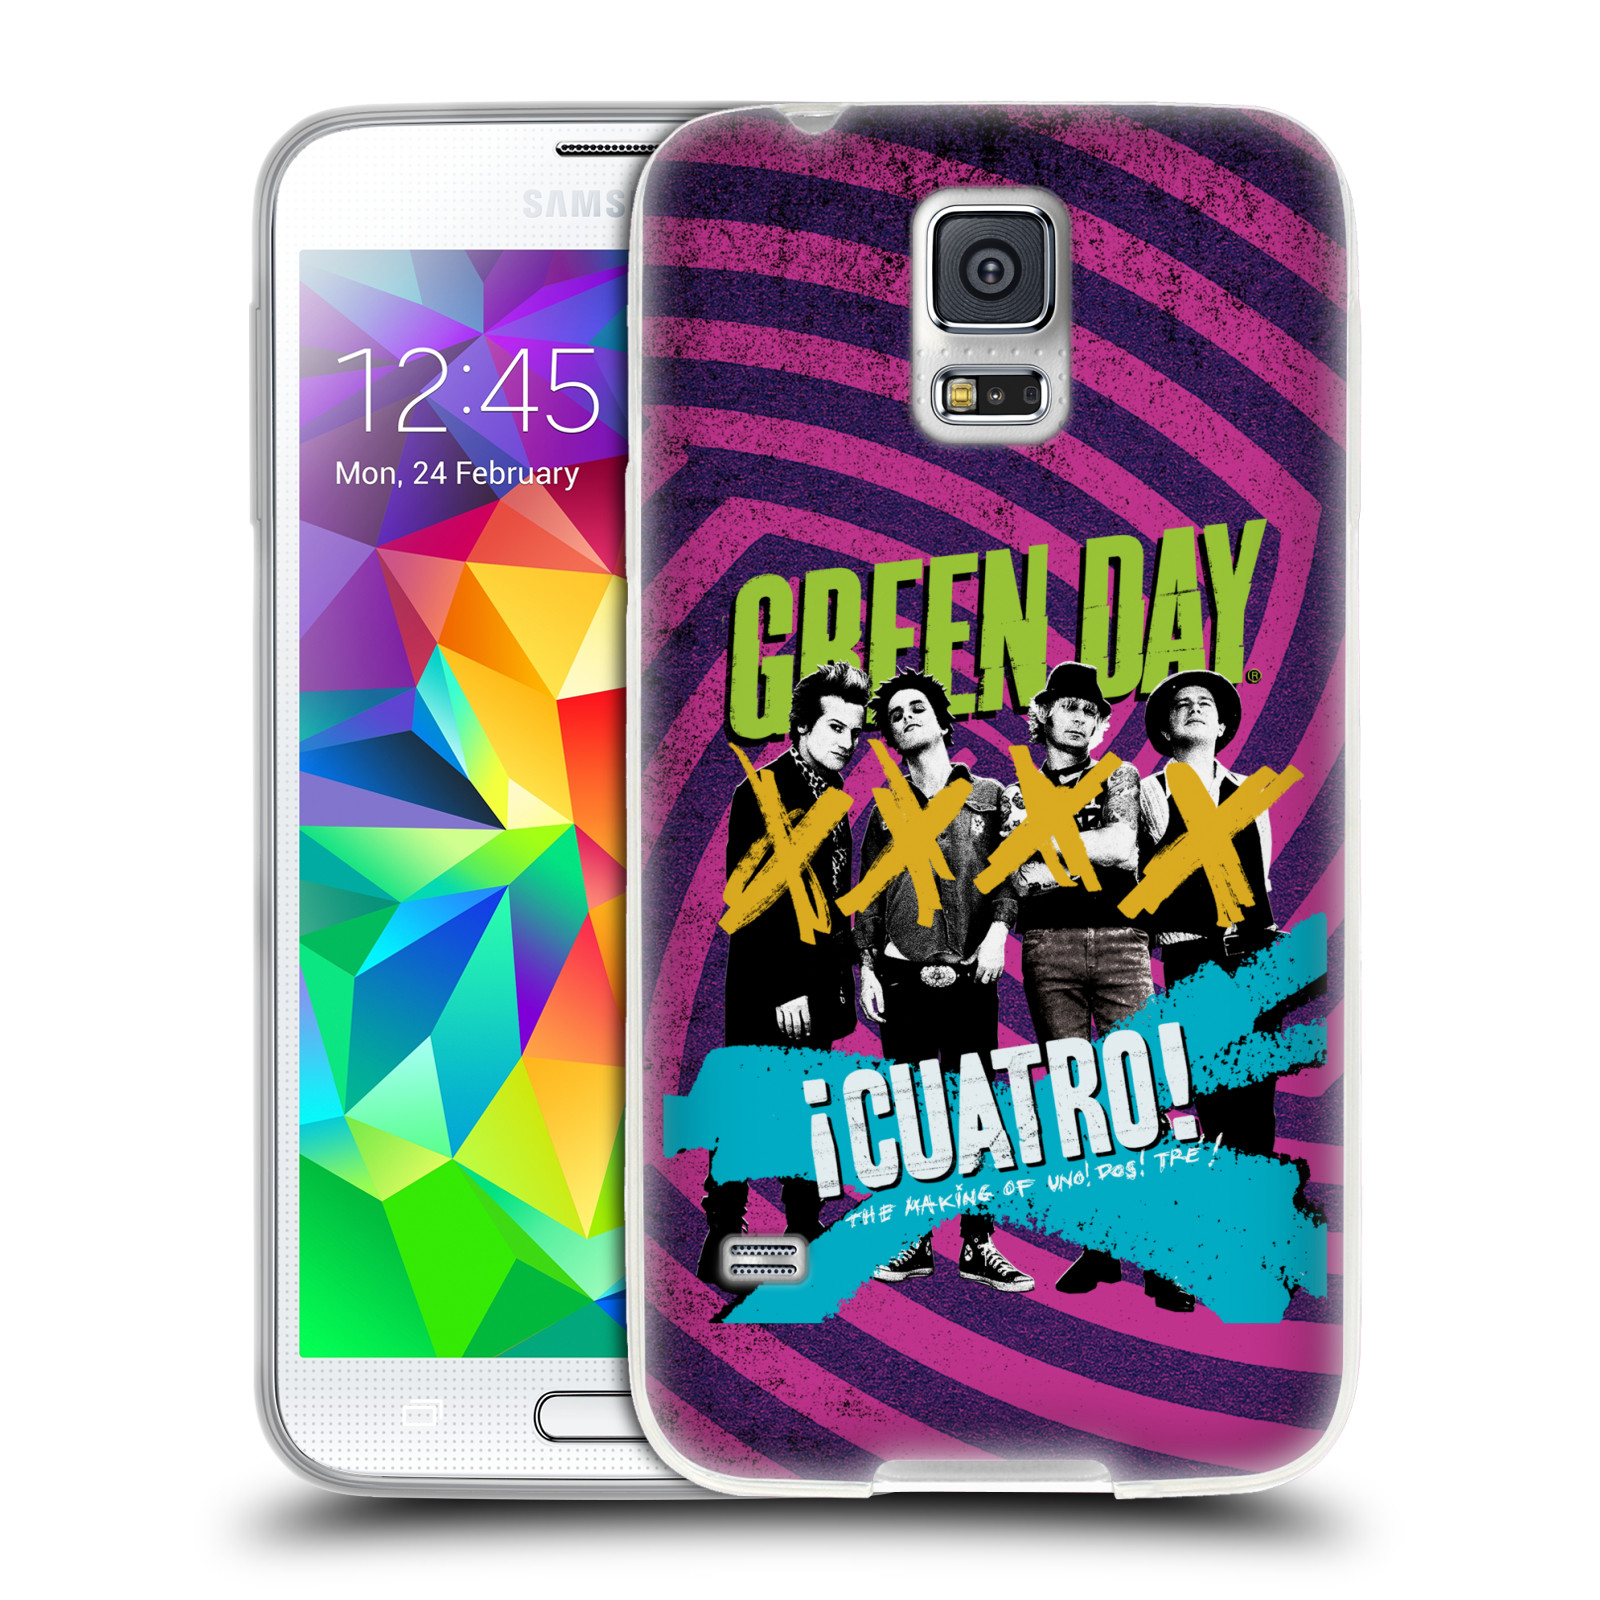 Silikonové pouzdro na mobil Samsung Galaxy S5 HEAD CASE Green Day - Cuatro